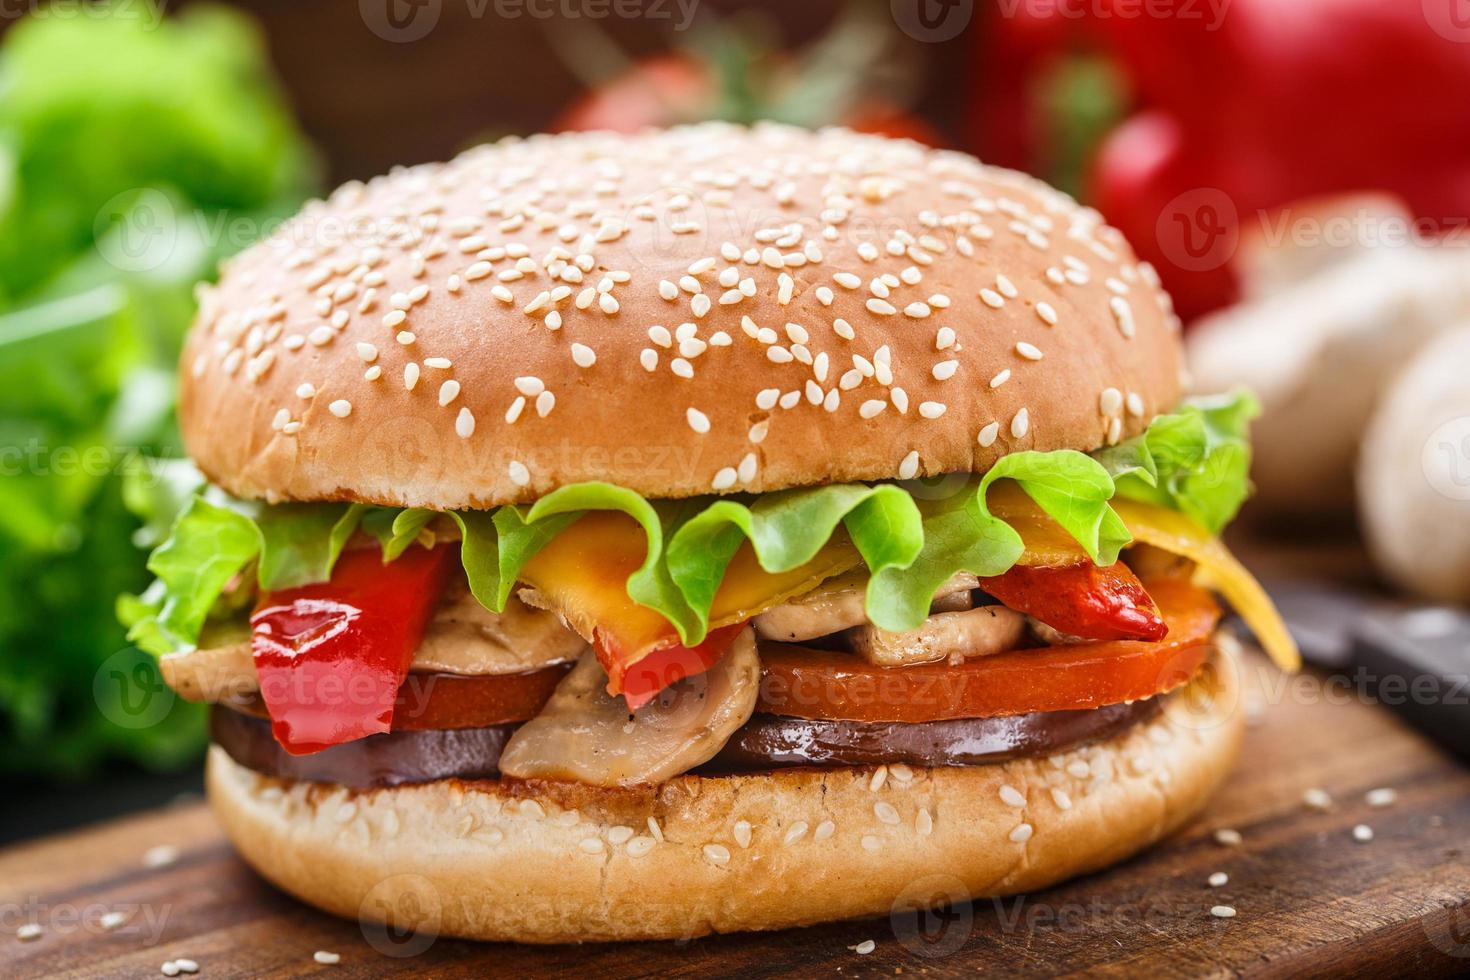 Vegetarian burger photo